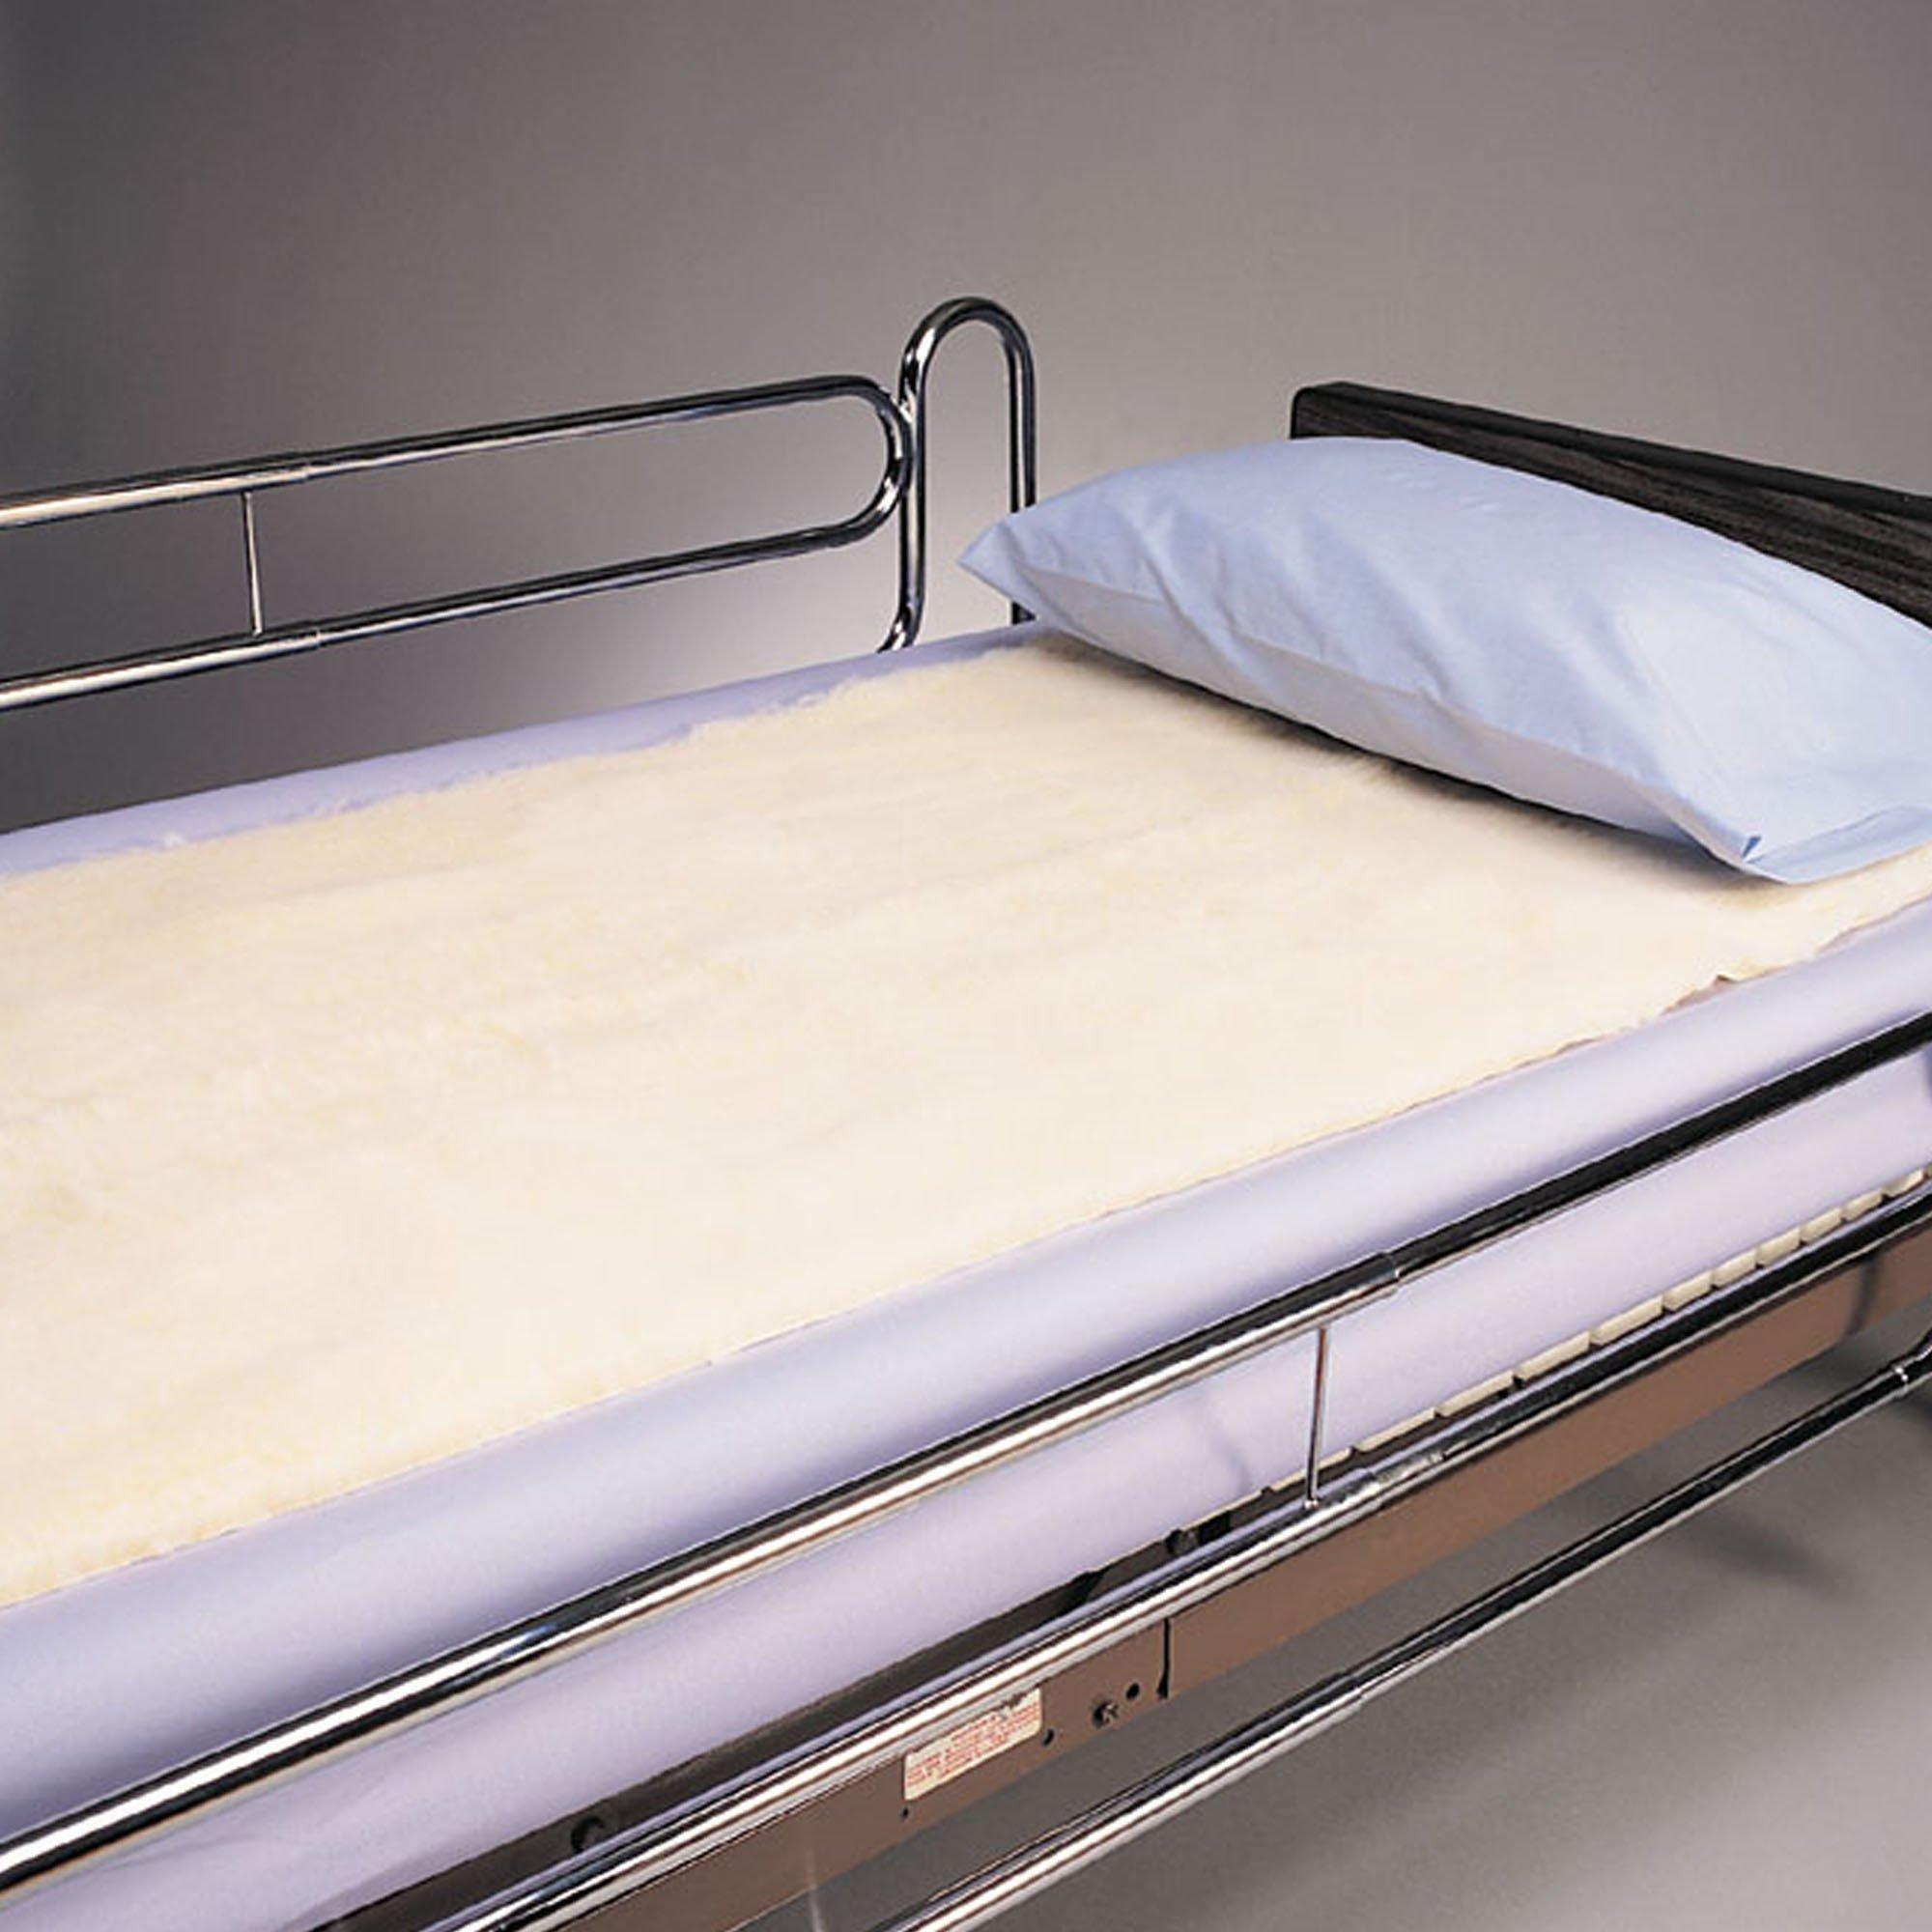 SkiL-Care Decubitus Bed Pad, White, 501090, 1 Pad